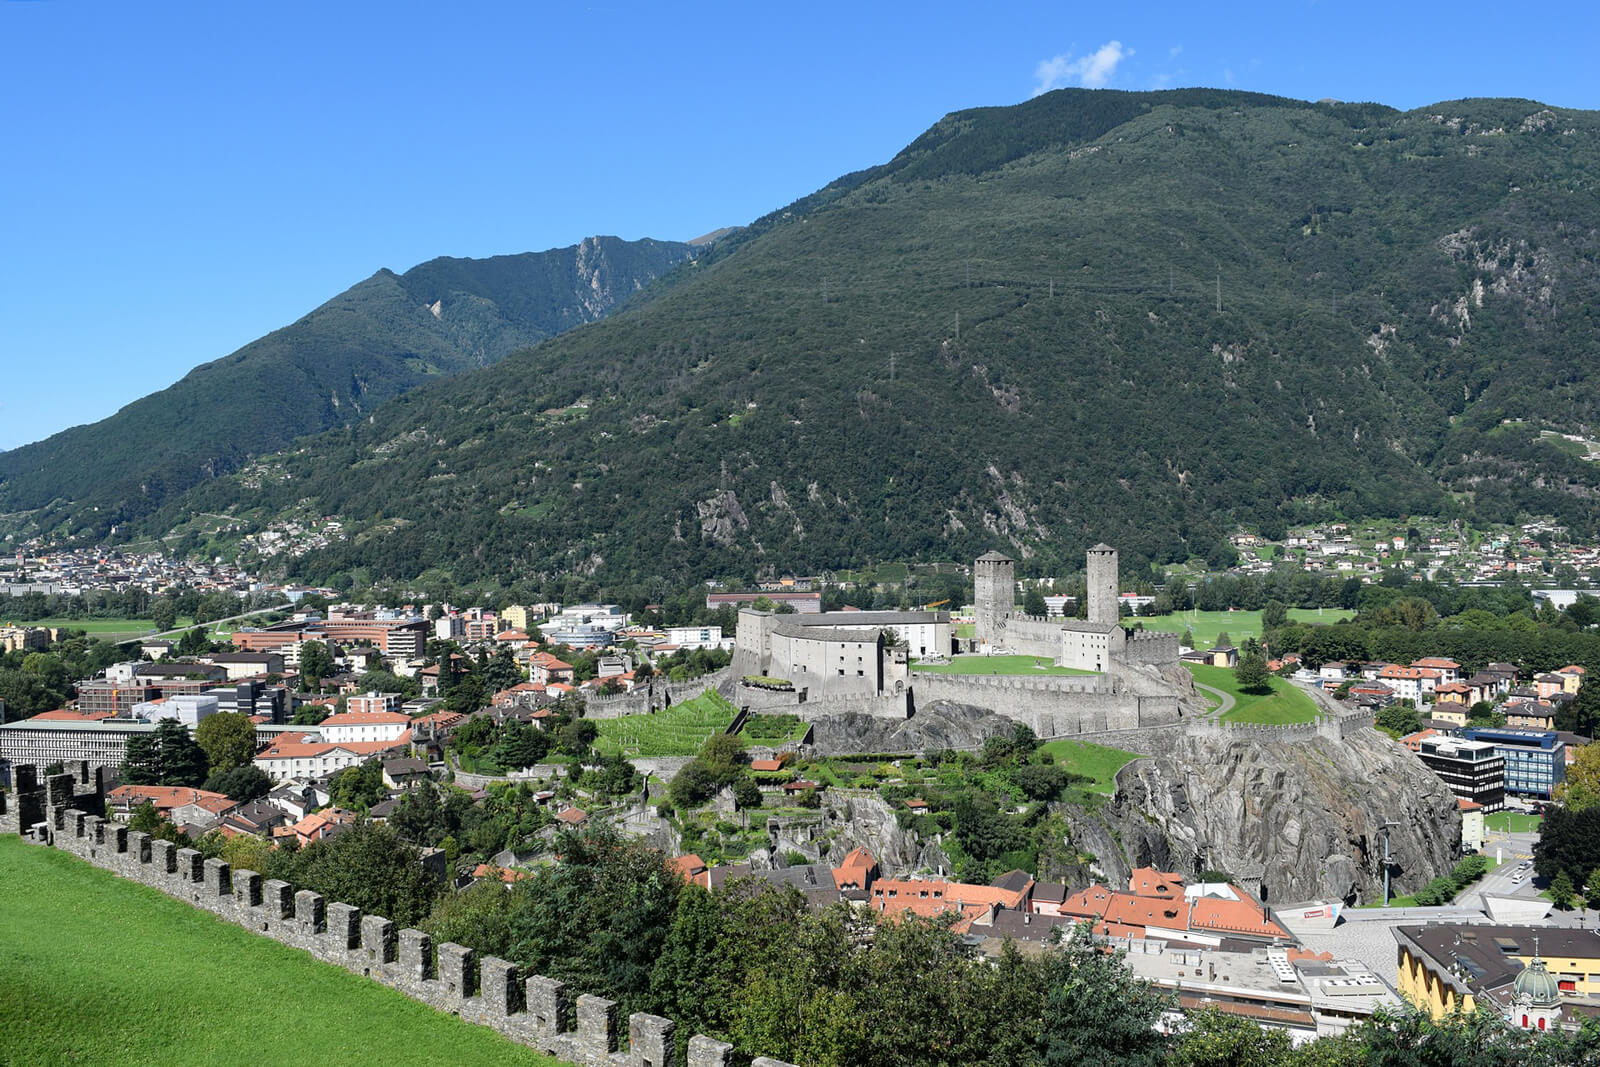 Bellinzona Castles - Copyright Paolo Ghedini